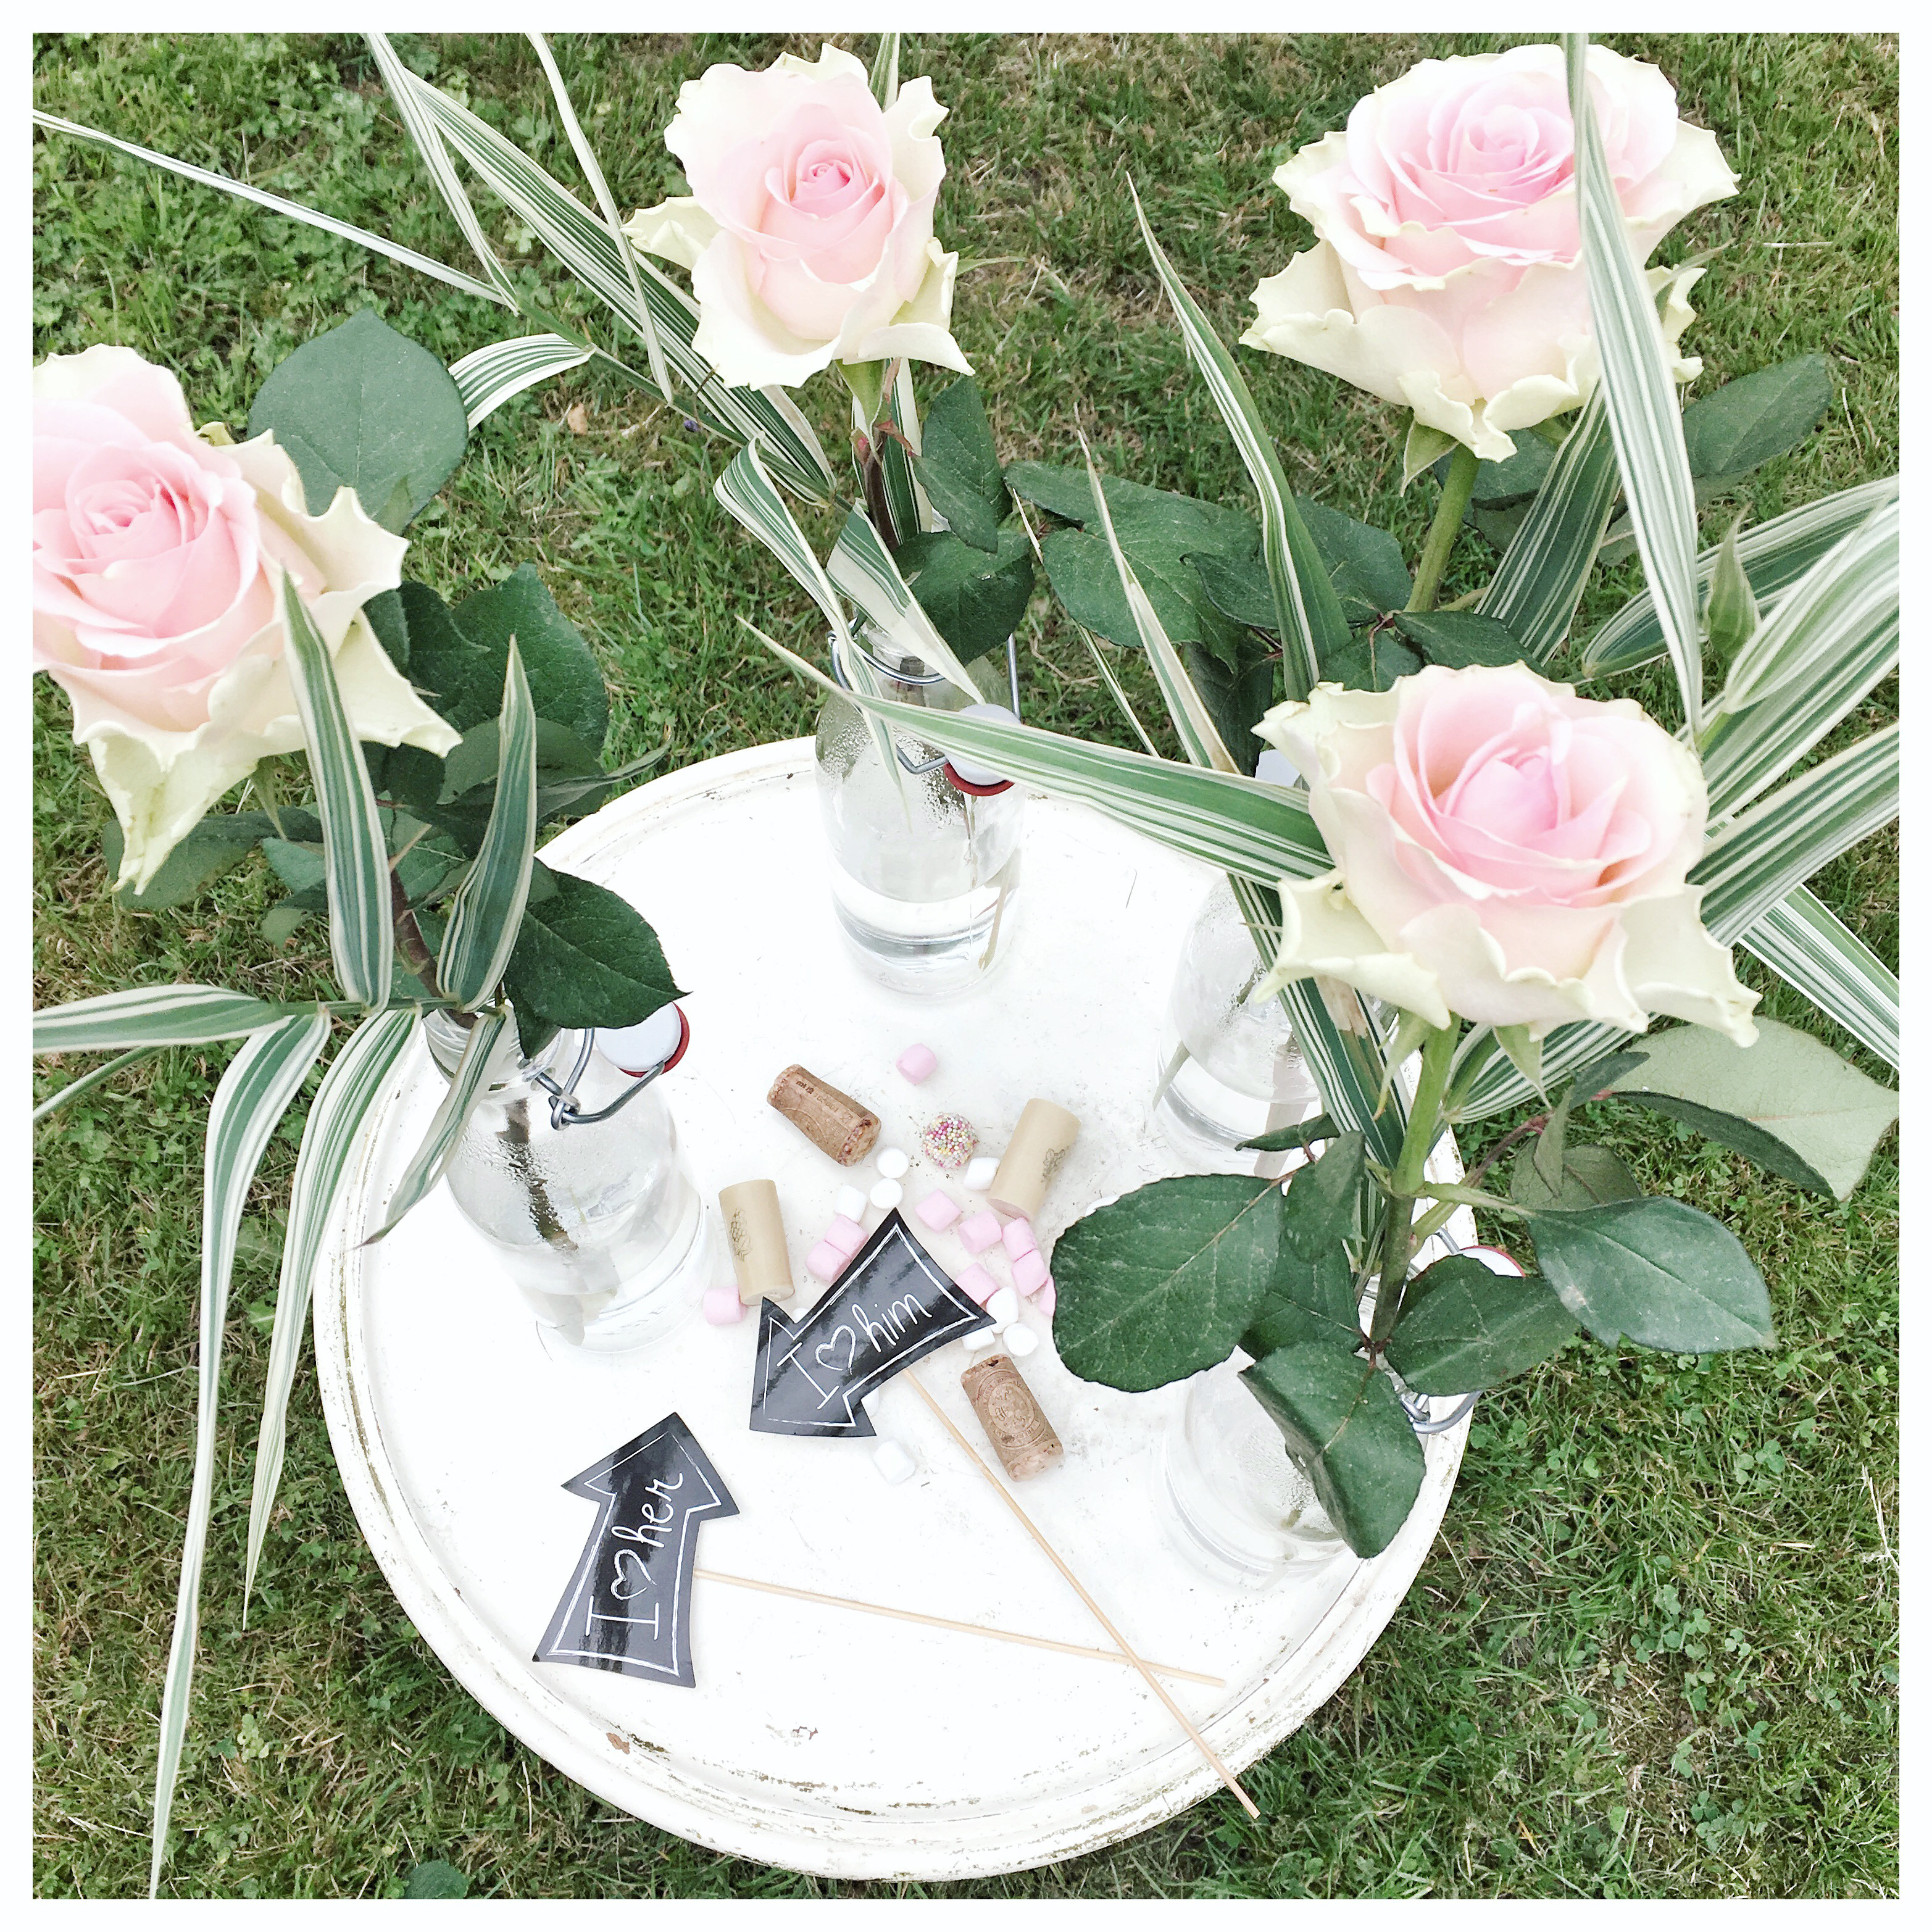 Populair Onze budget bruiloft | moneymom.nl #LJ22